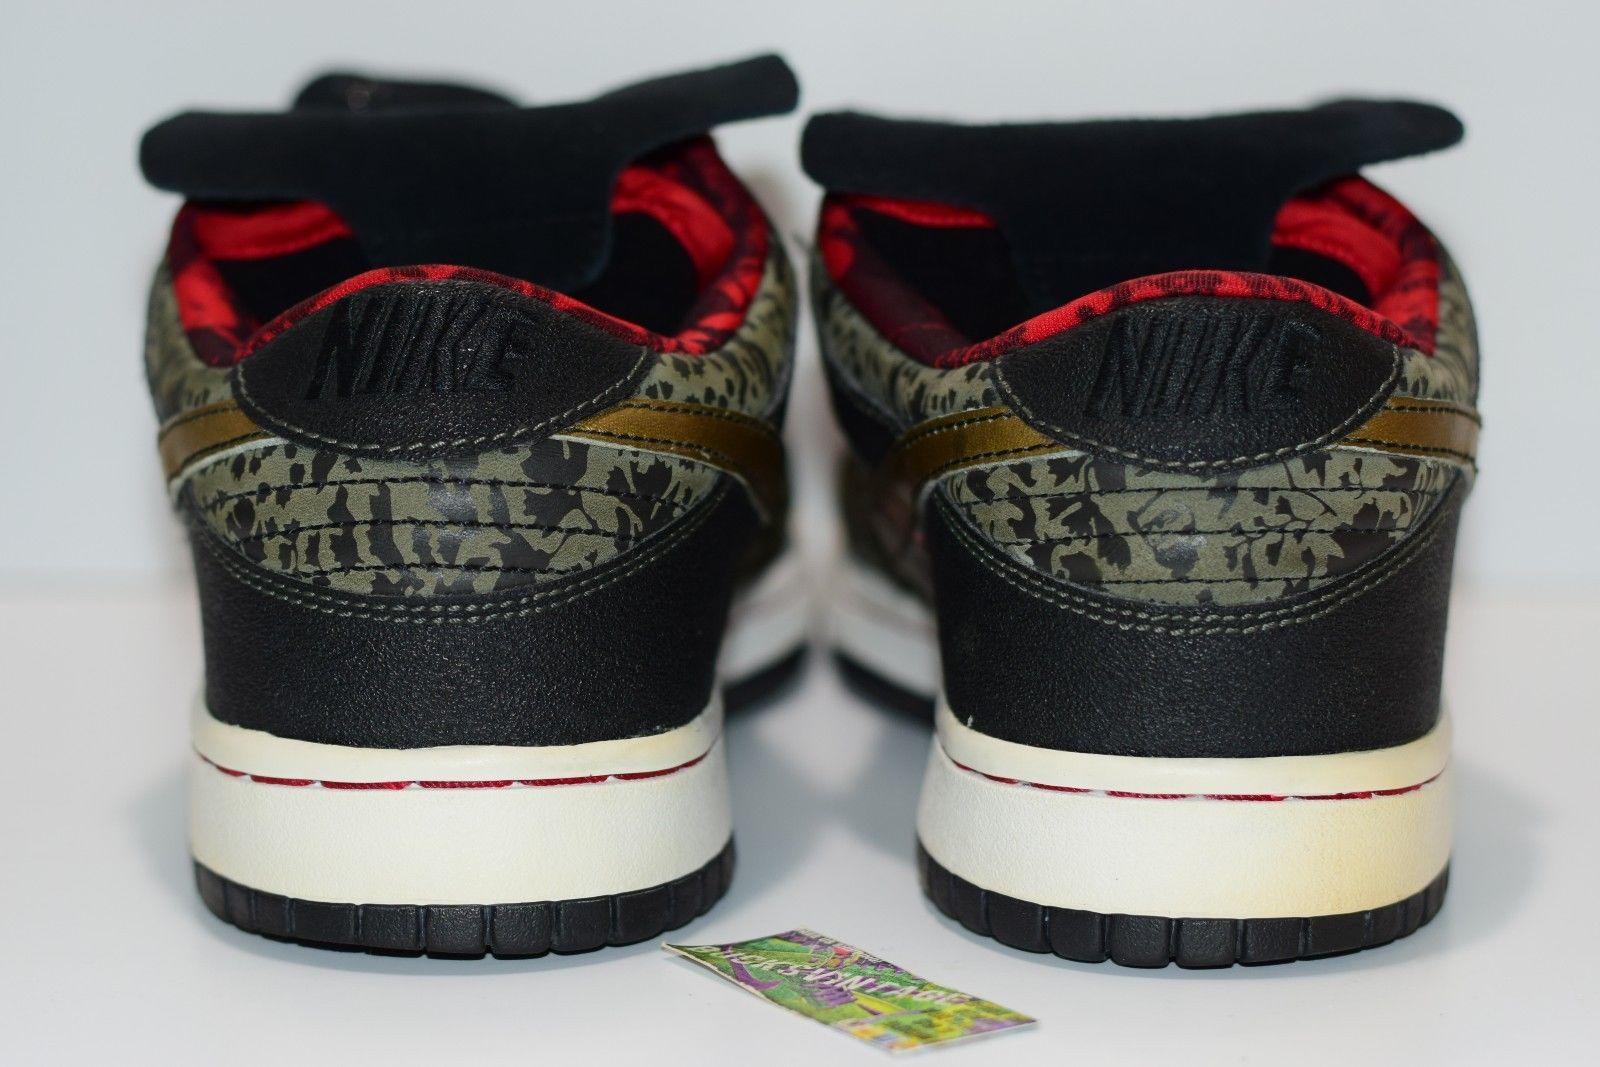 sports shoes 0a056 b1689 ... where can i buy size 9 2006 nike dunk sb low premium sbtg royal fam  313170